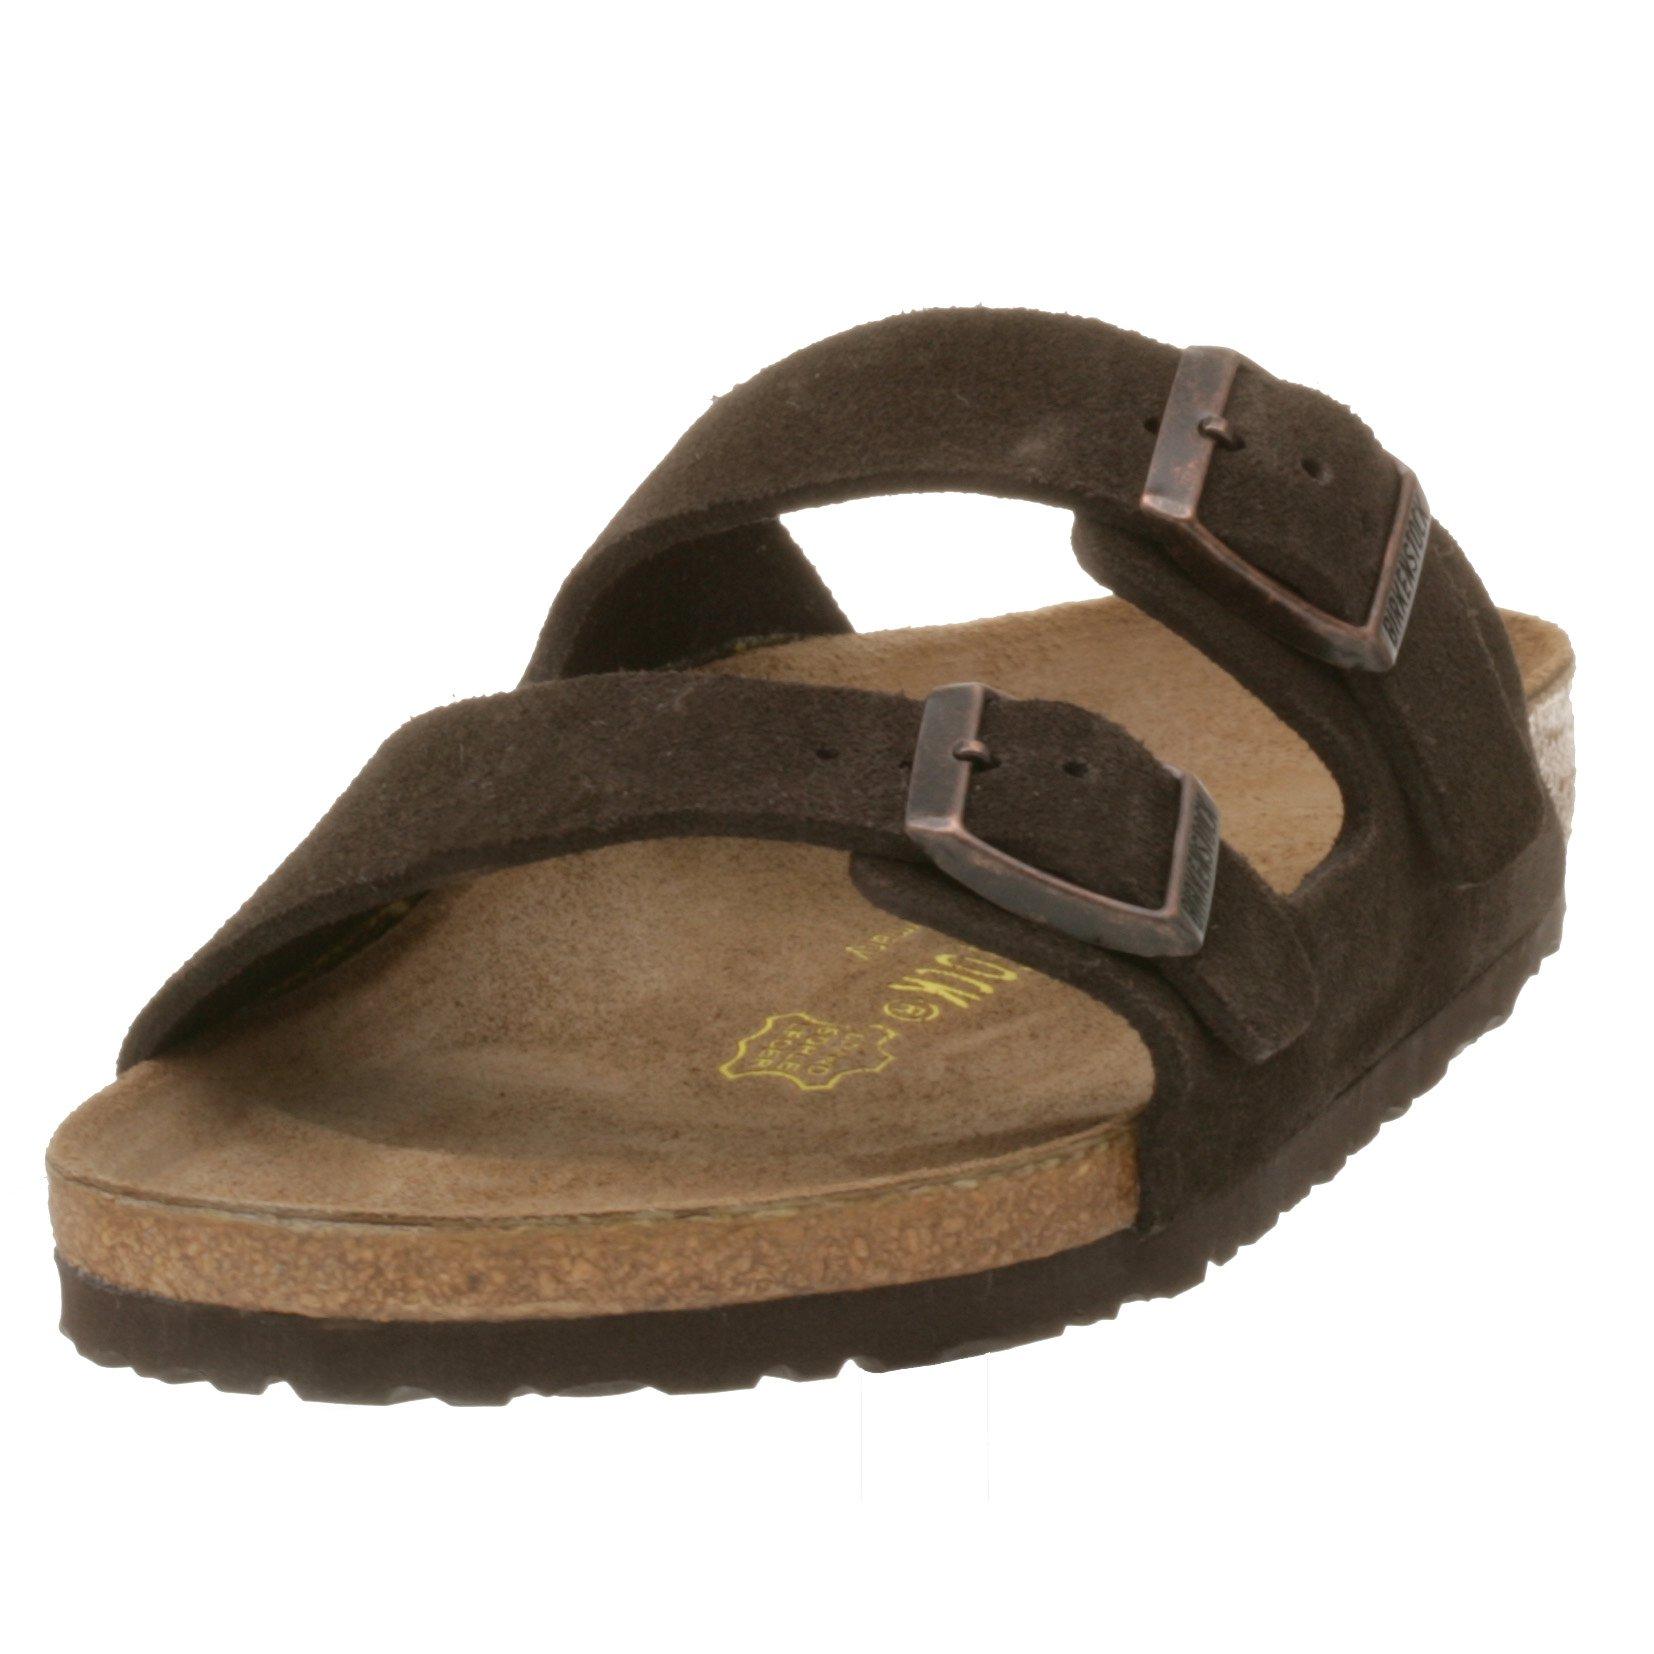 Birkenstock Unisex Arizona Mocha Suede Sandal 41 N (US Men's 8-8.5 / US Women's 10-10.5)